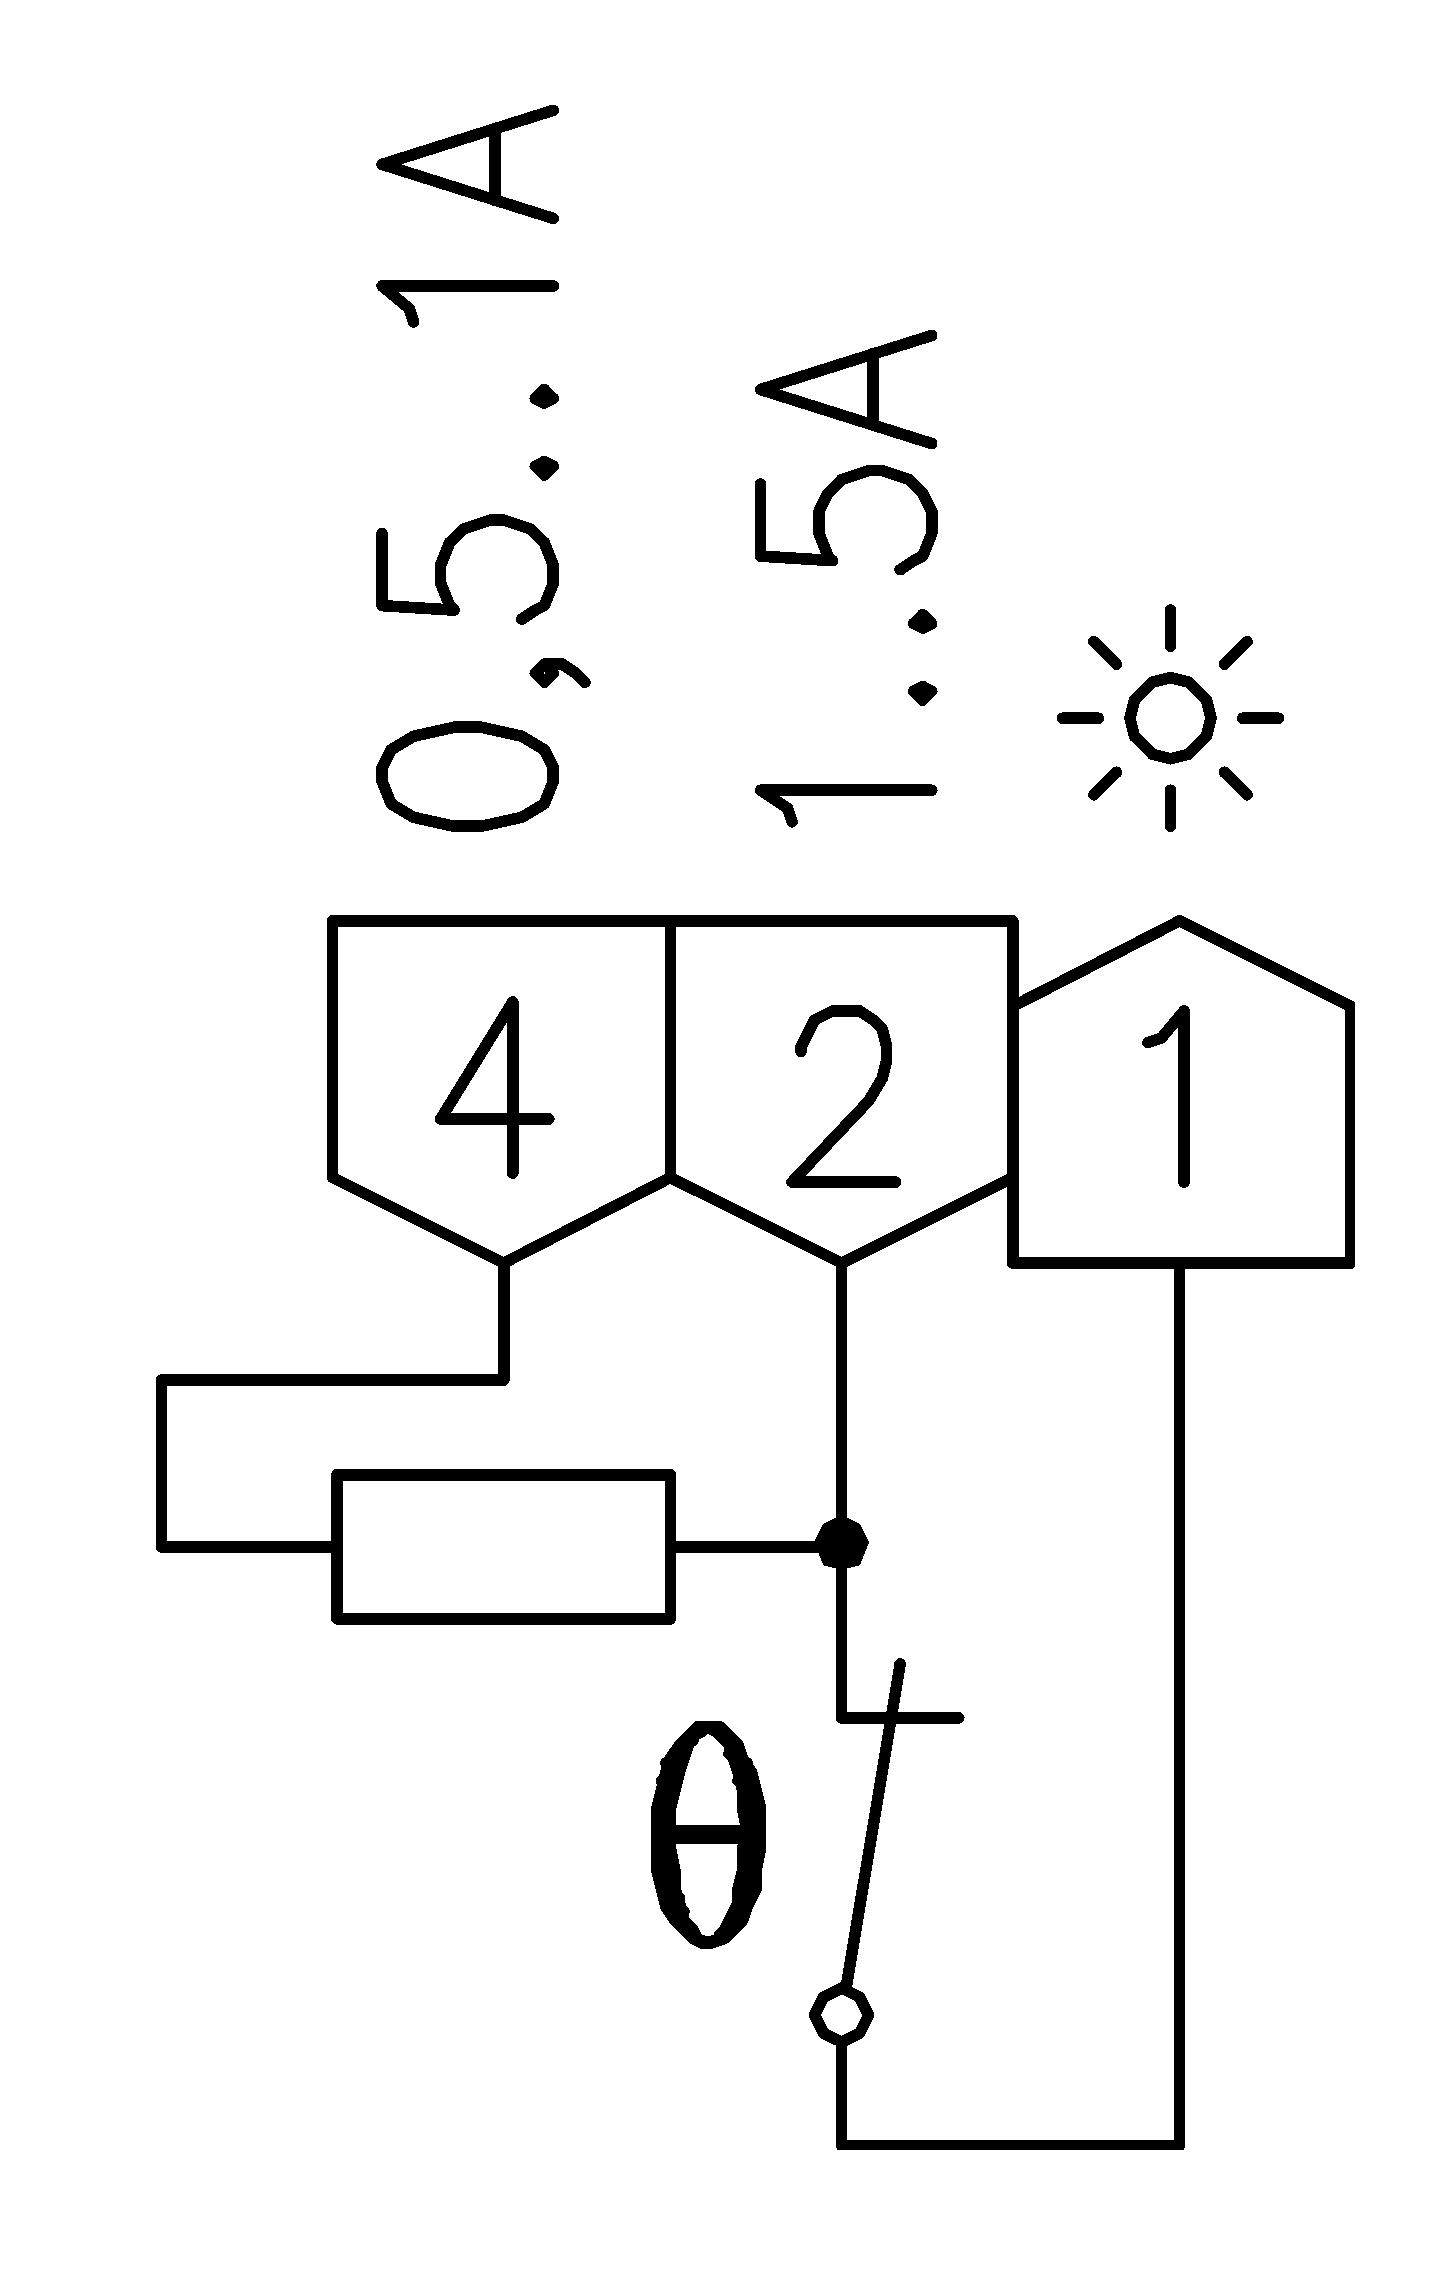 MA013401 Circuit diagram